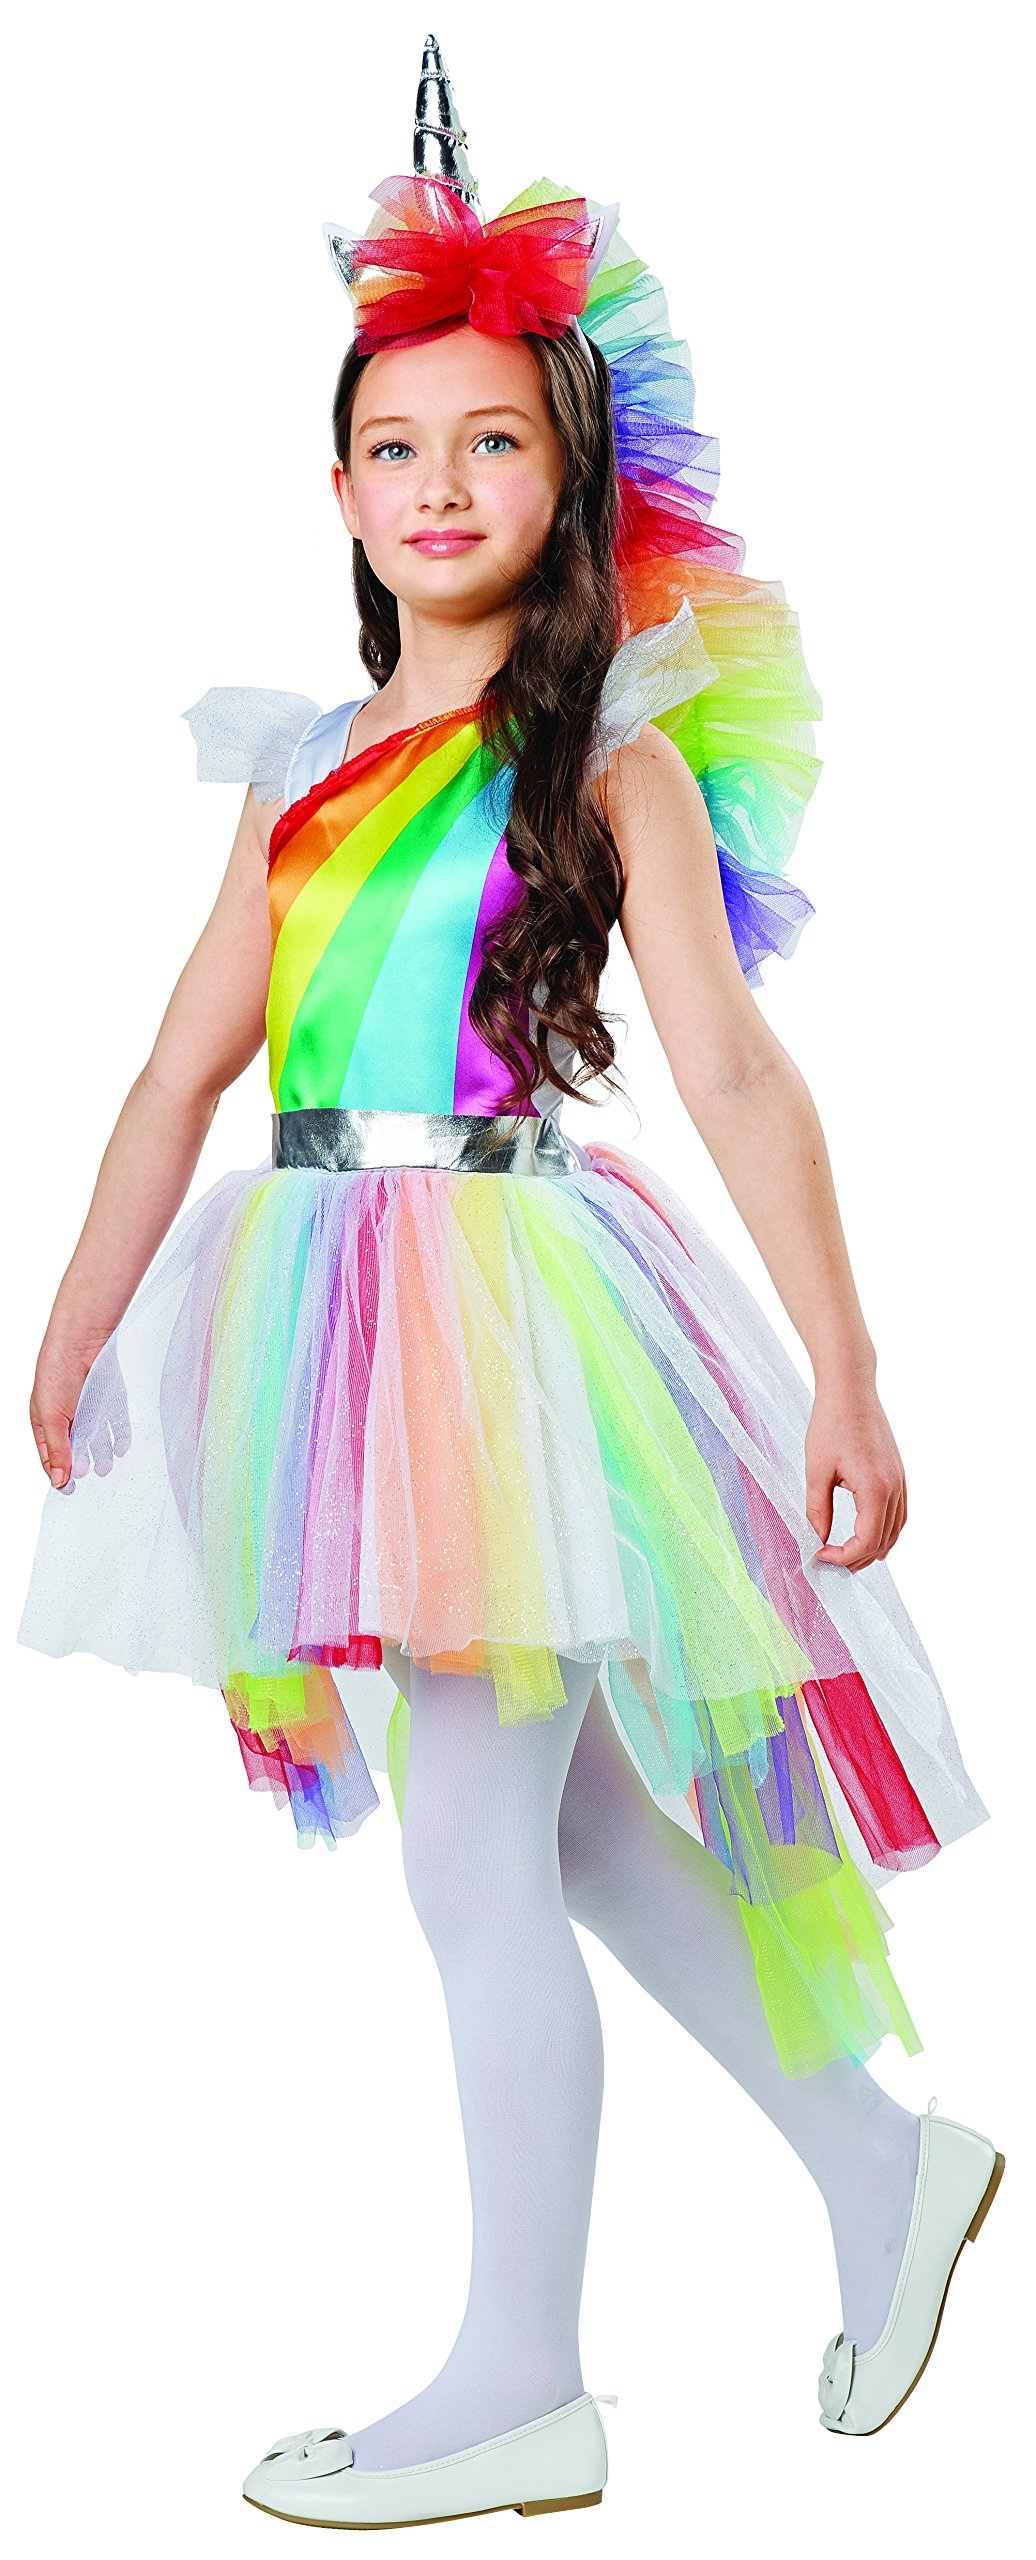 4be881aa29d0 Amazon.com  Rainbow Unicorn Dress Up Costume